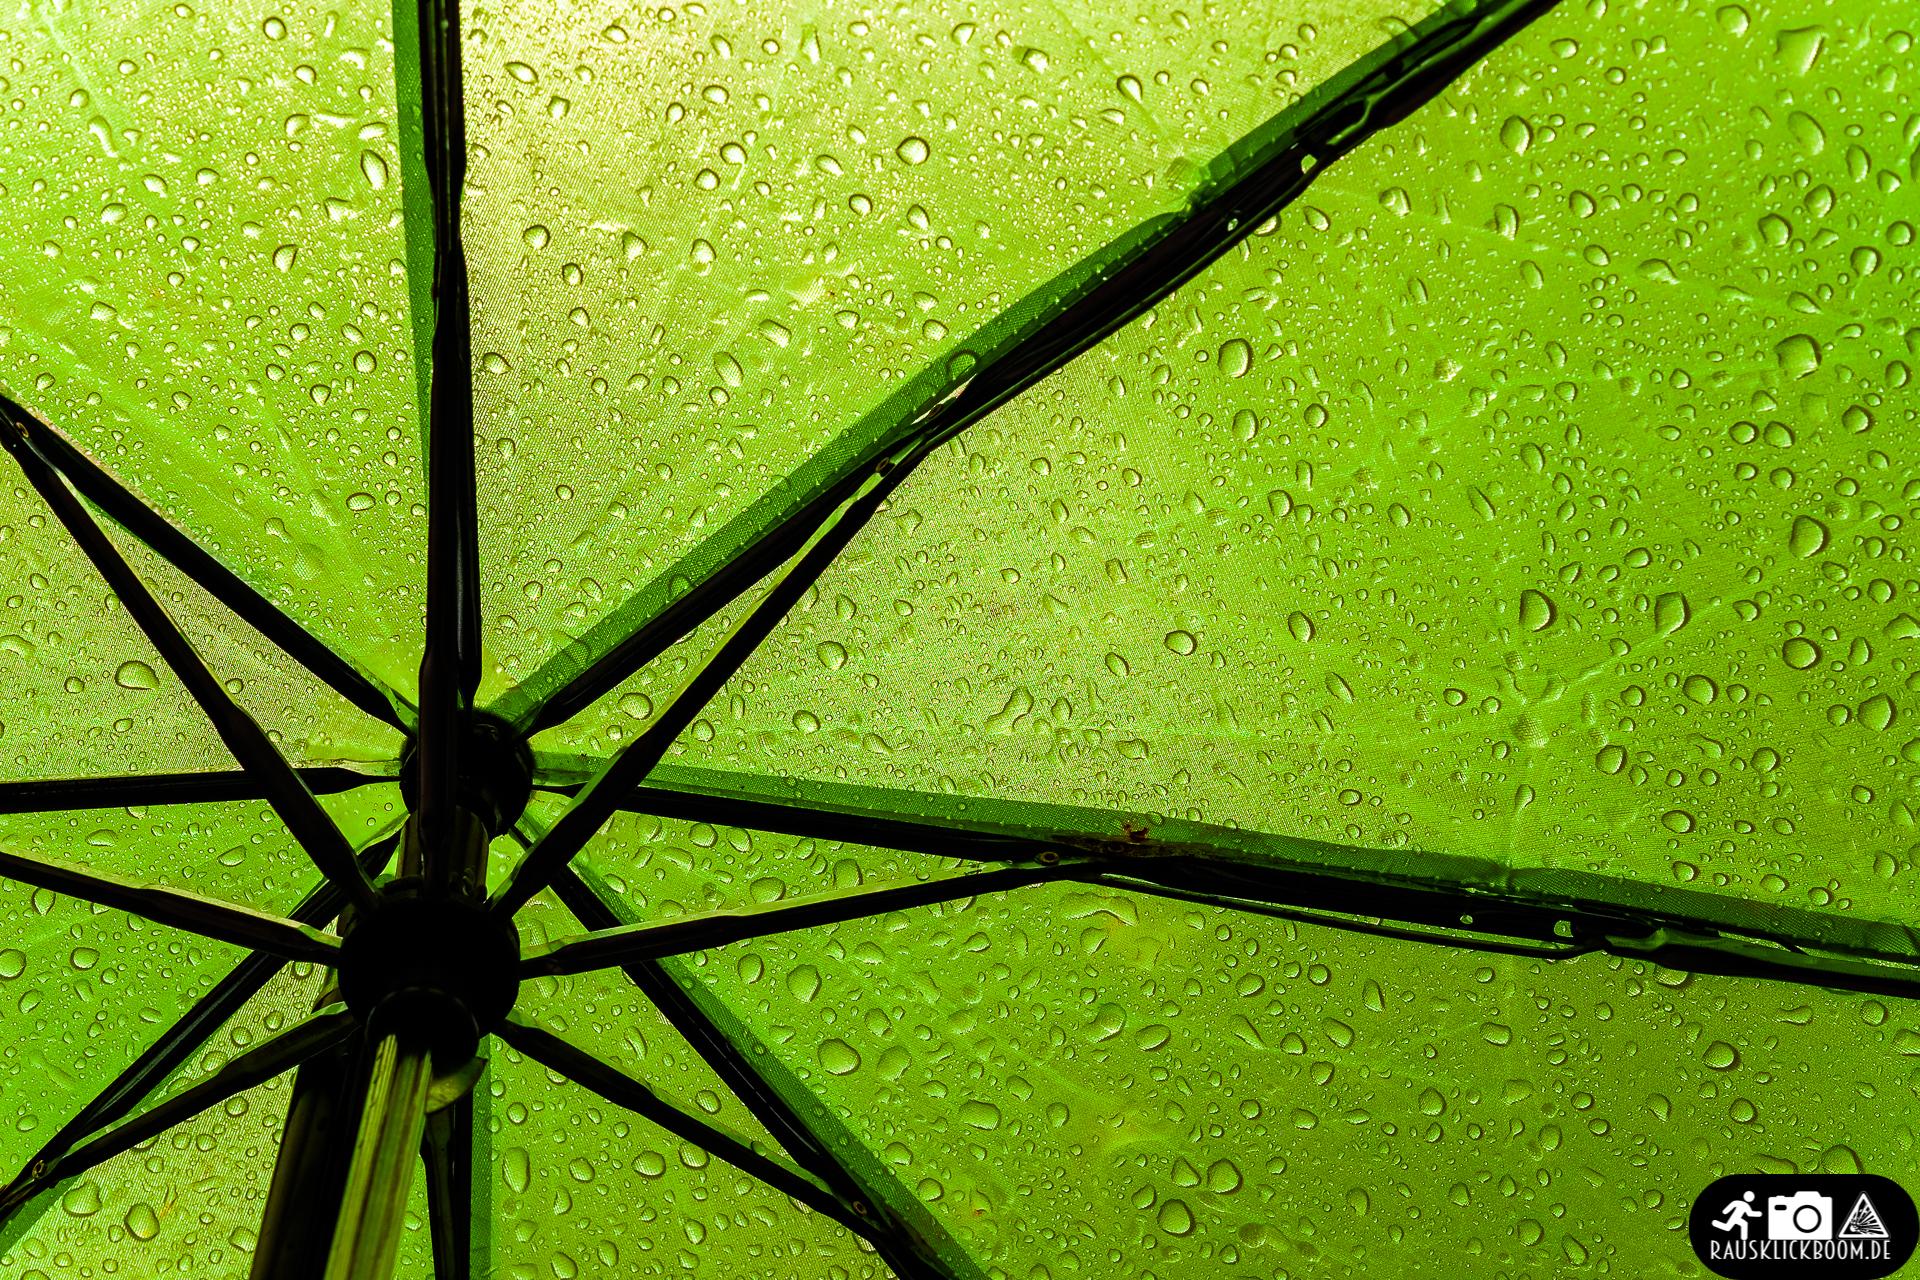 Bildgeschichte-Schirm-1